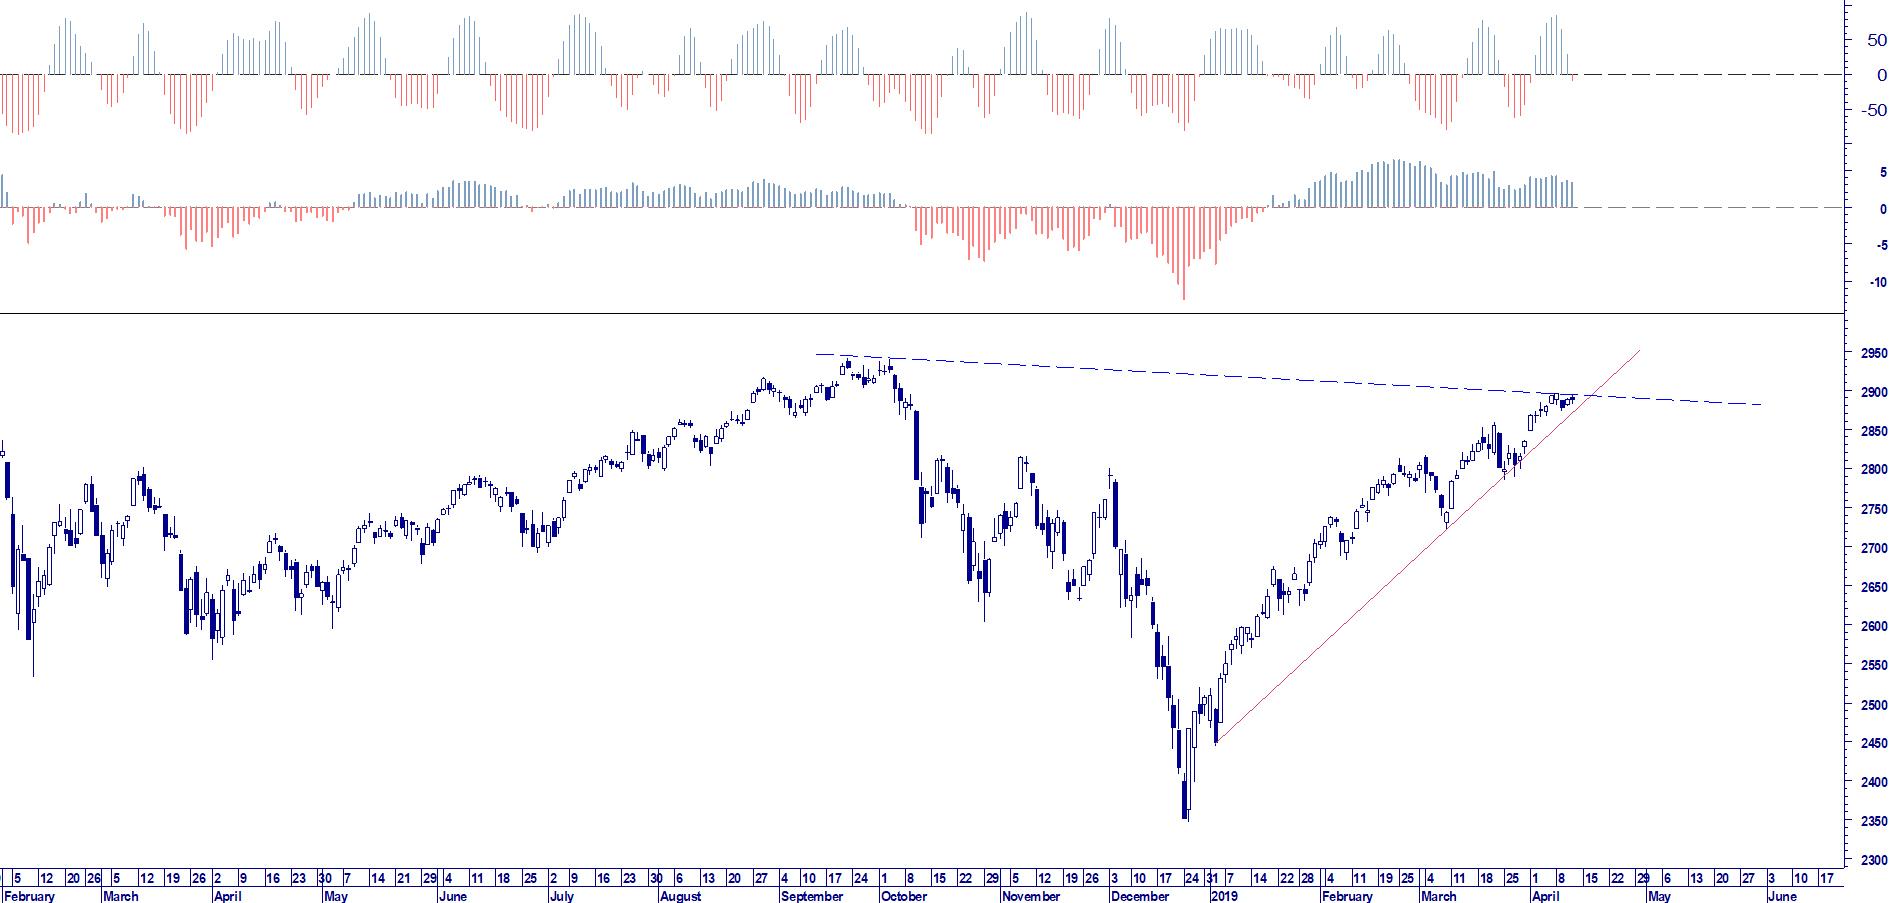 WB ANALYTICS: S&P 500 ADVANCE CYCLE INDICATOR